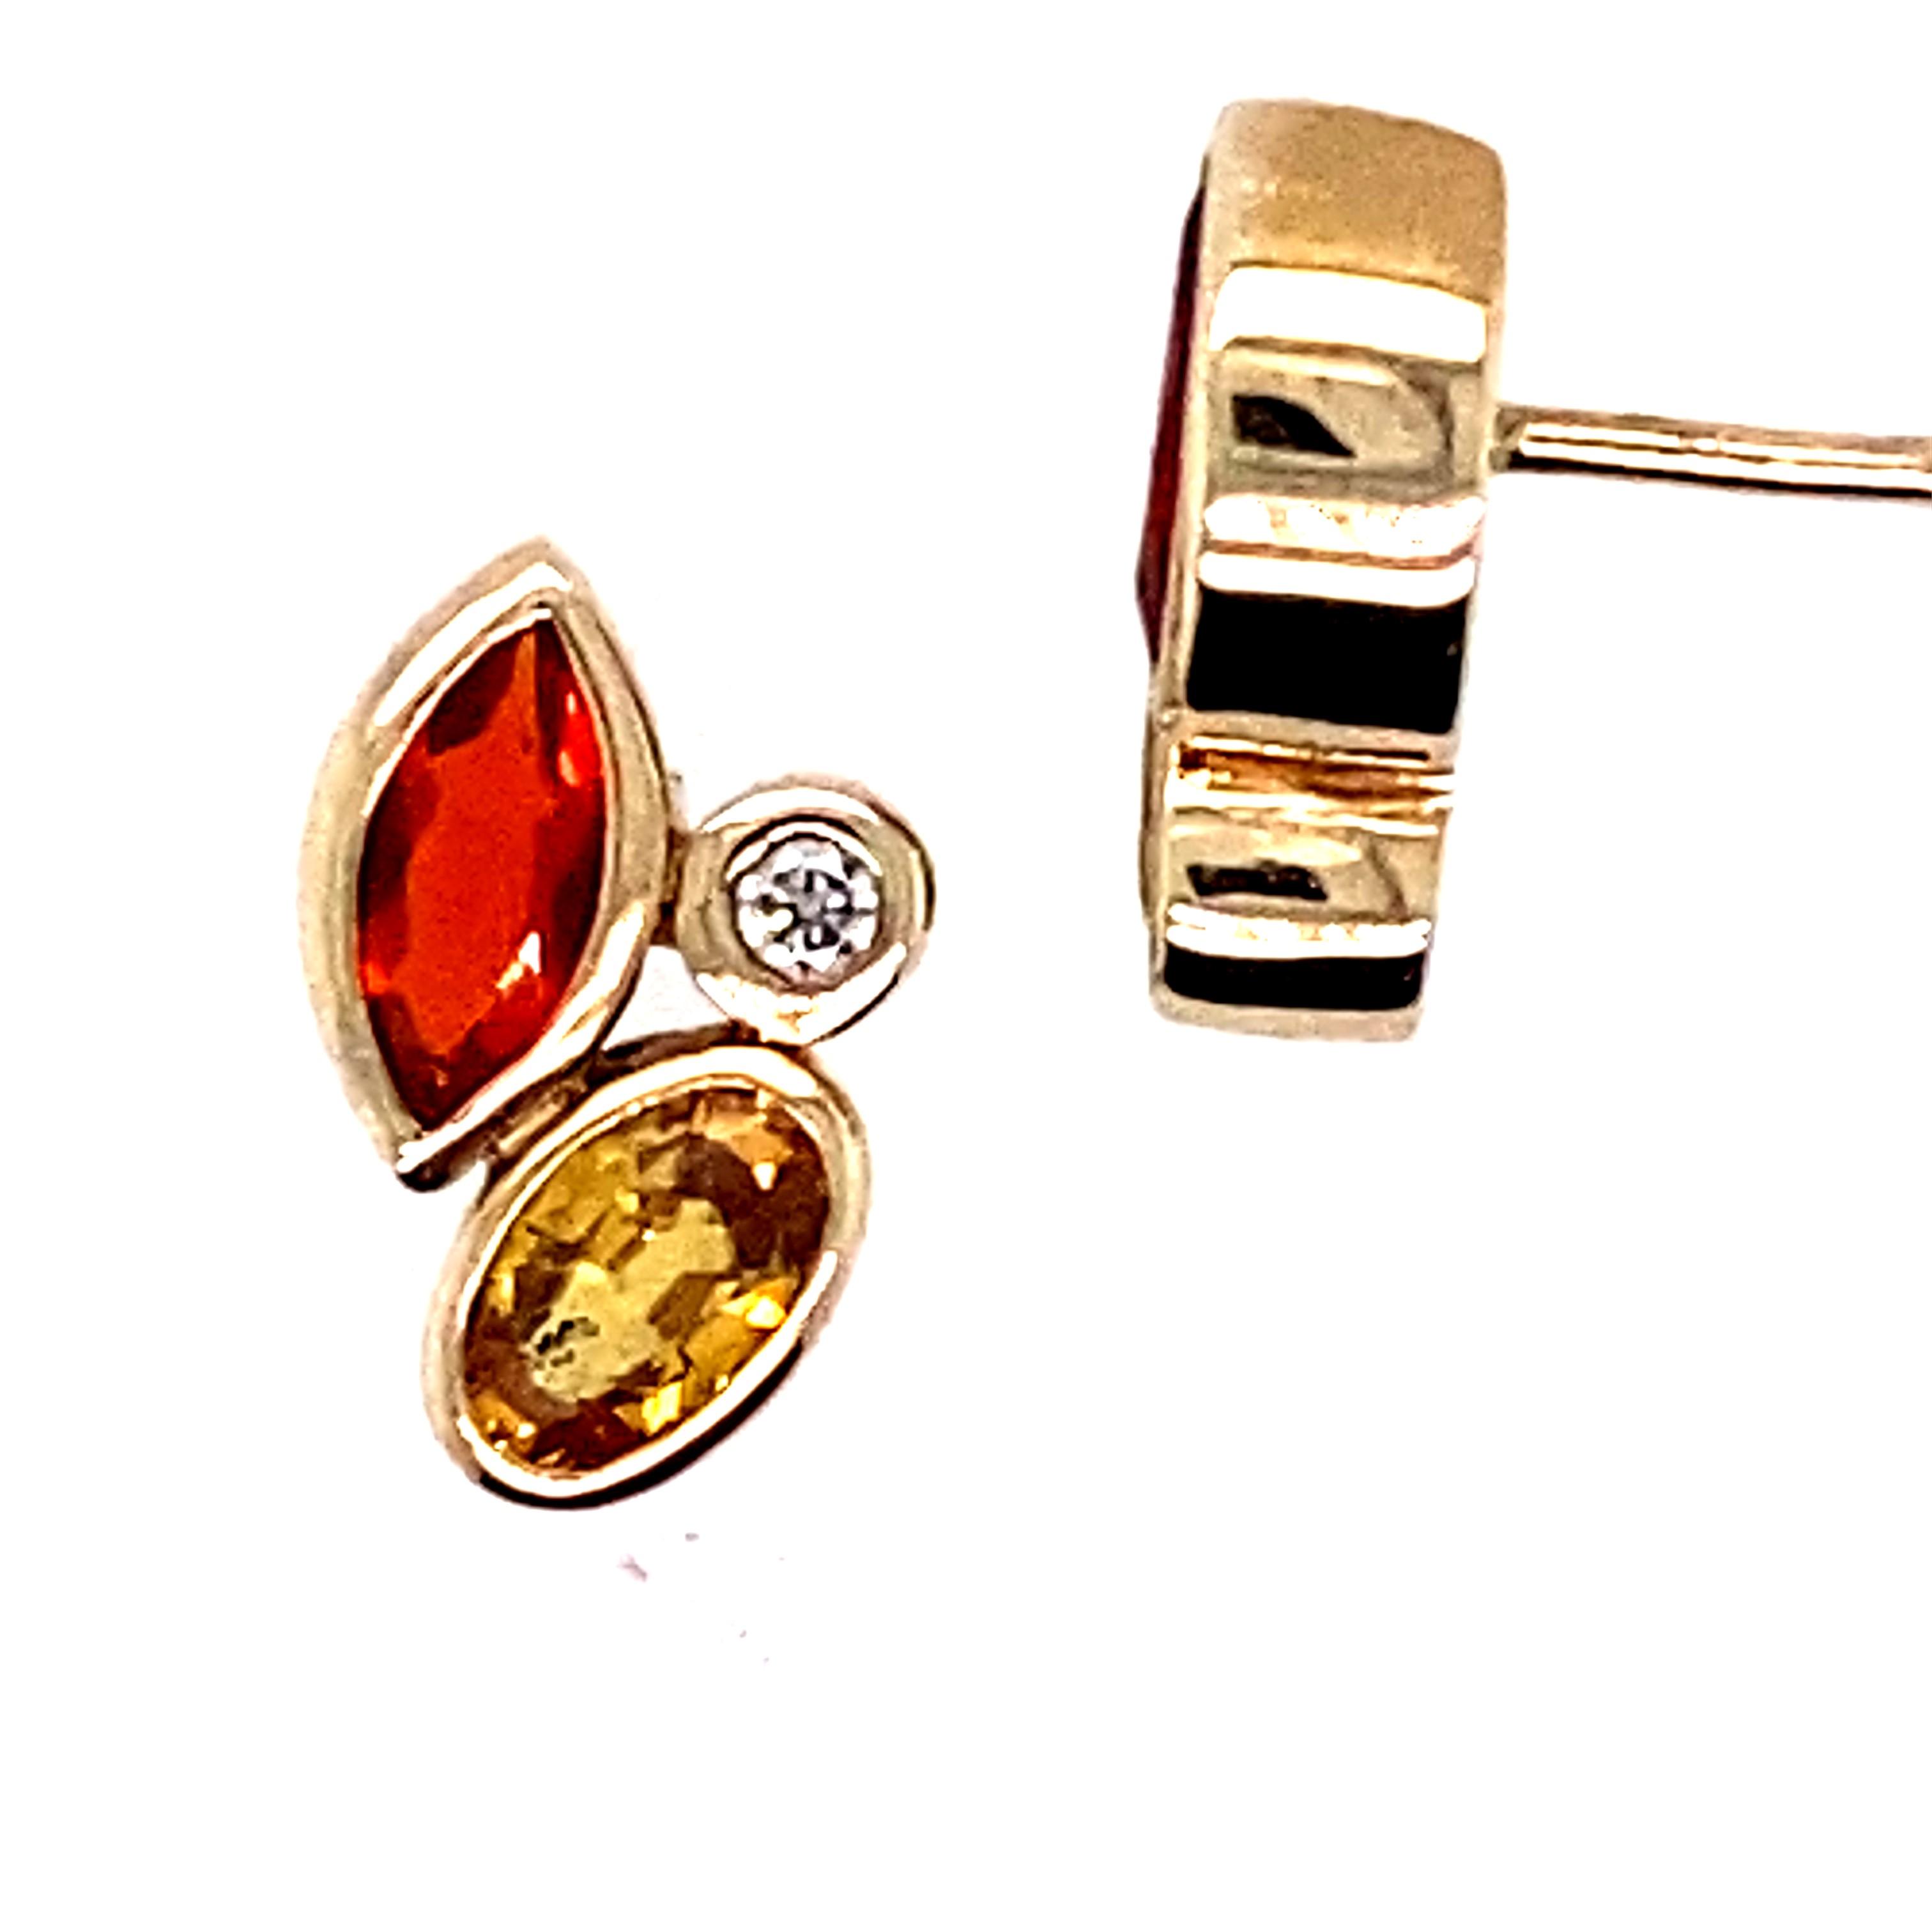 9 Carat Yellow Gold, Fire Opal, Yellow Sapphire and Diamond Stud